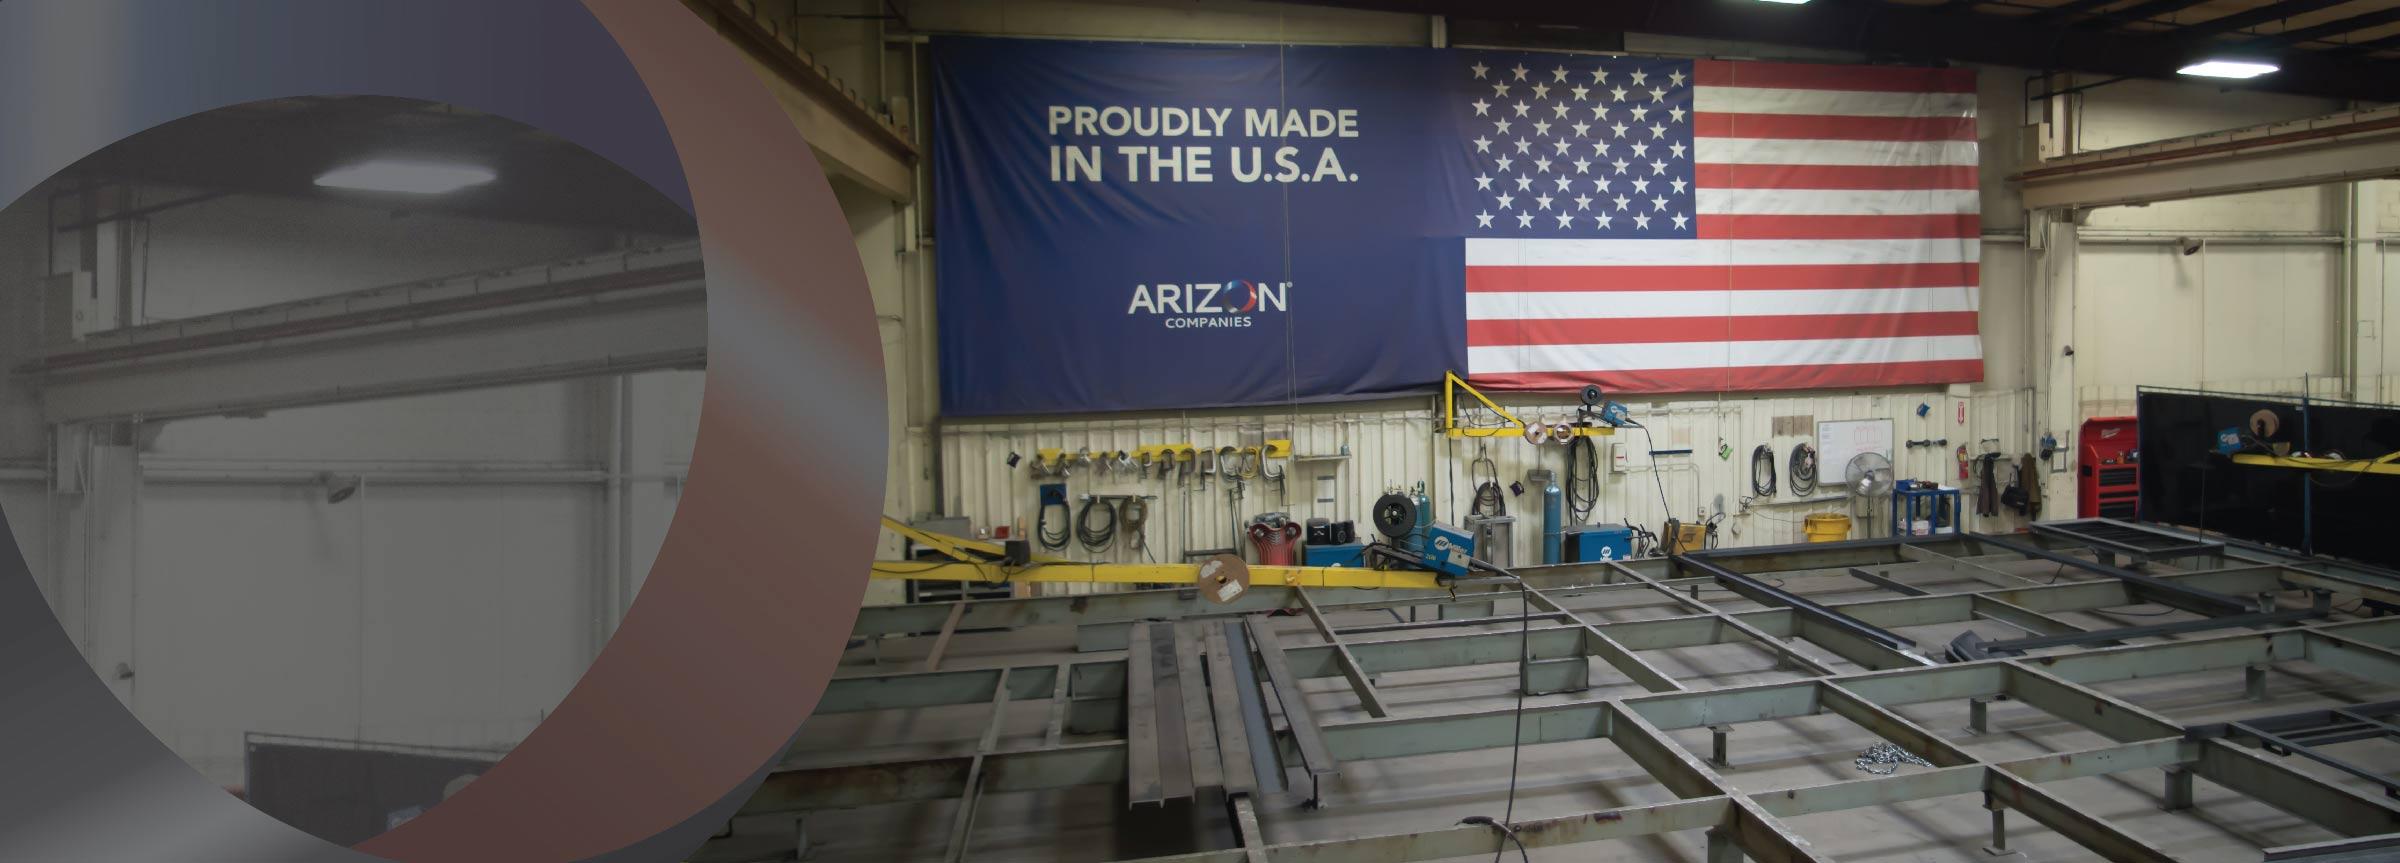 Arizon Companies Family Of Brands Careers History